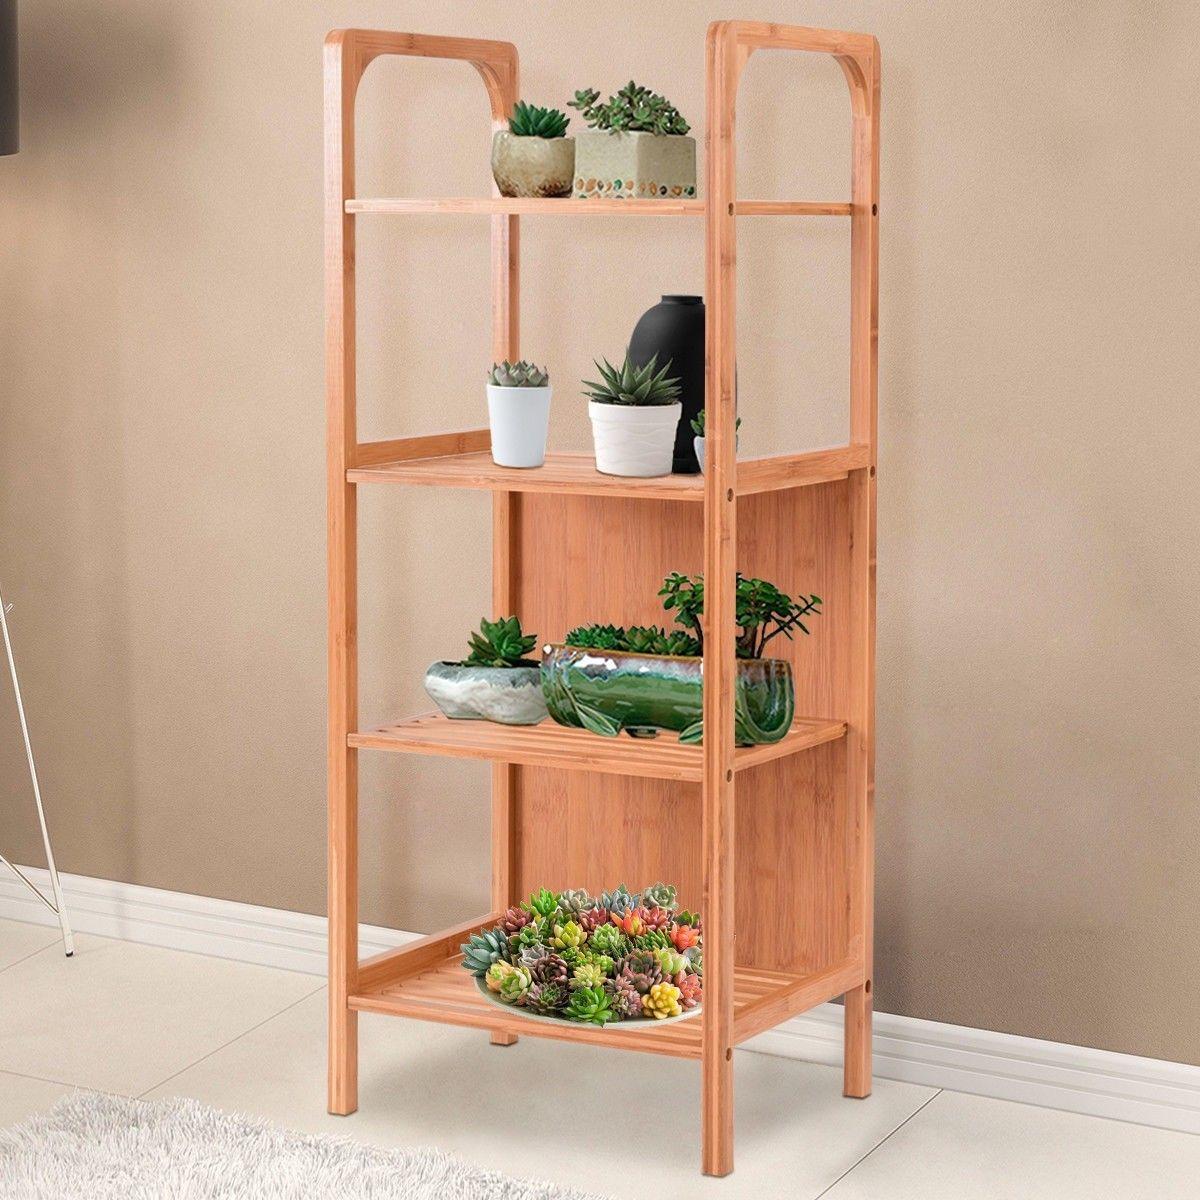 4 tiers bamboo bathroom shelf storage unit tower rack home rh pinterest com